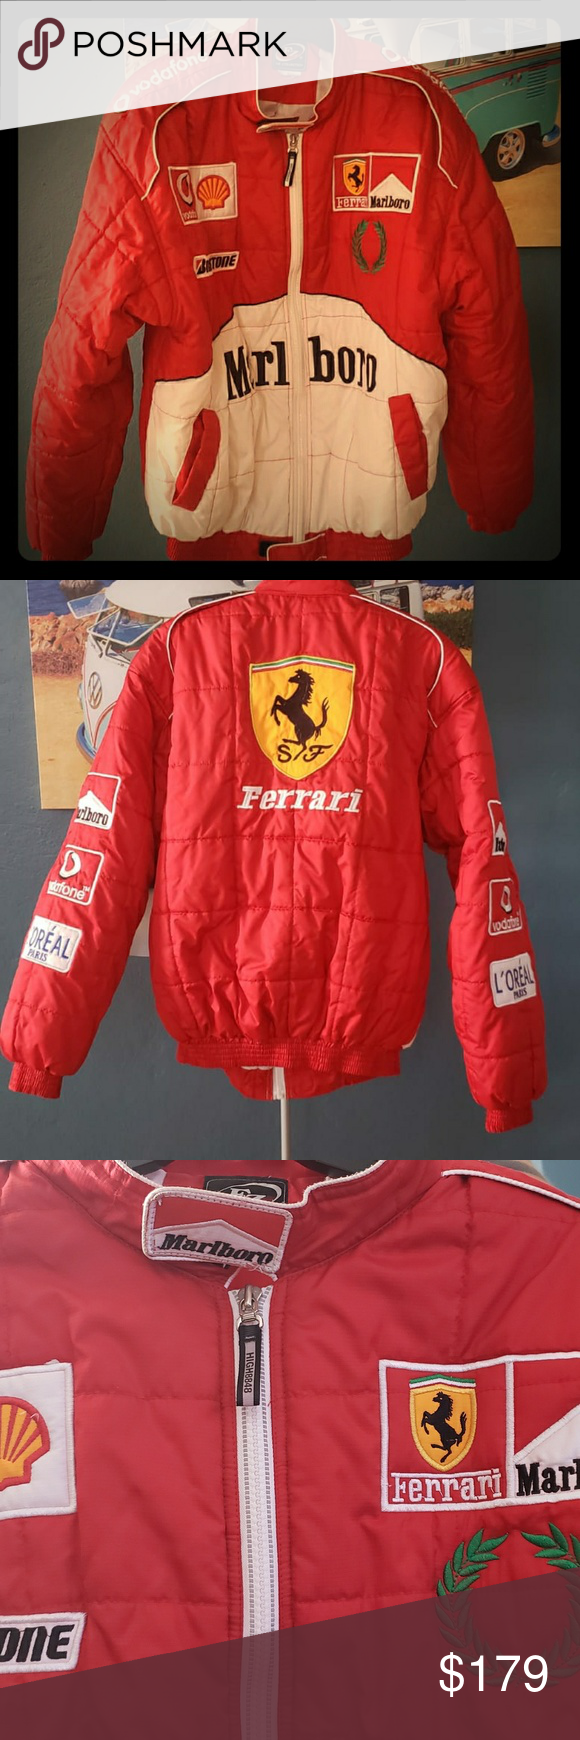 Vintage Fz Ferrari Marlboro Loreal Jacket Vintage Fz The Collection Ferrari Marlboro Loreal Jacket F1 Red Racing Cond Clothes Design Jackets Fashion Design